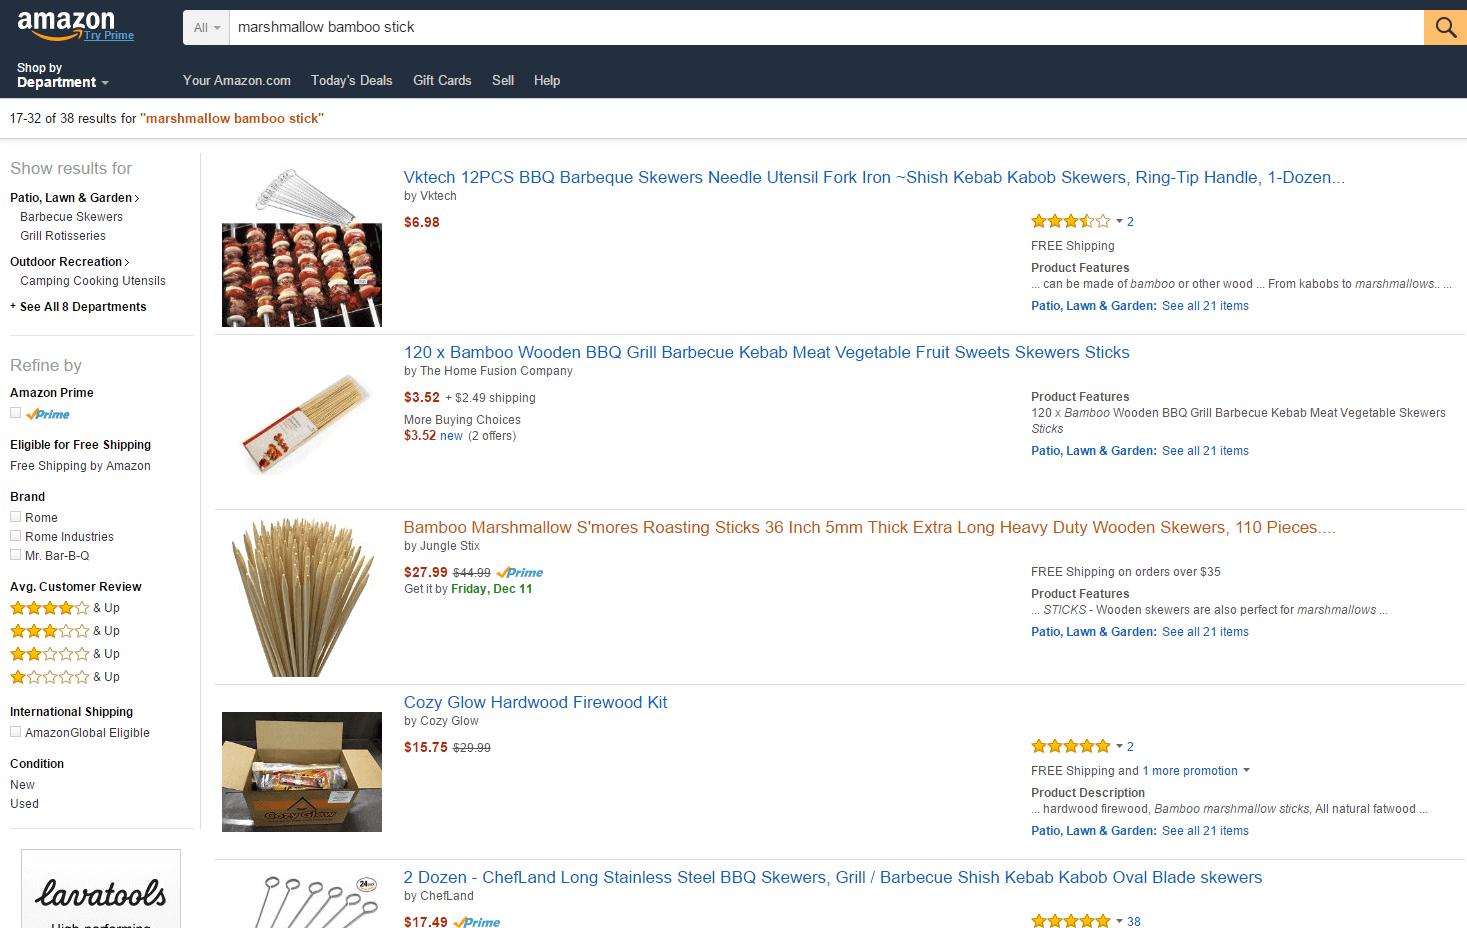 Jungle Stix organic listing